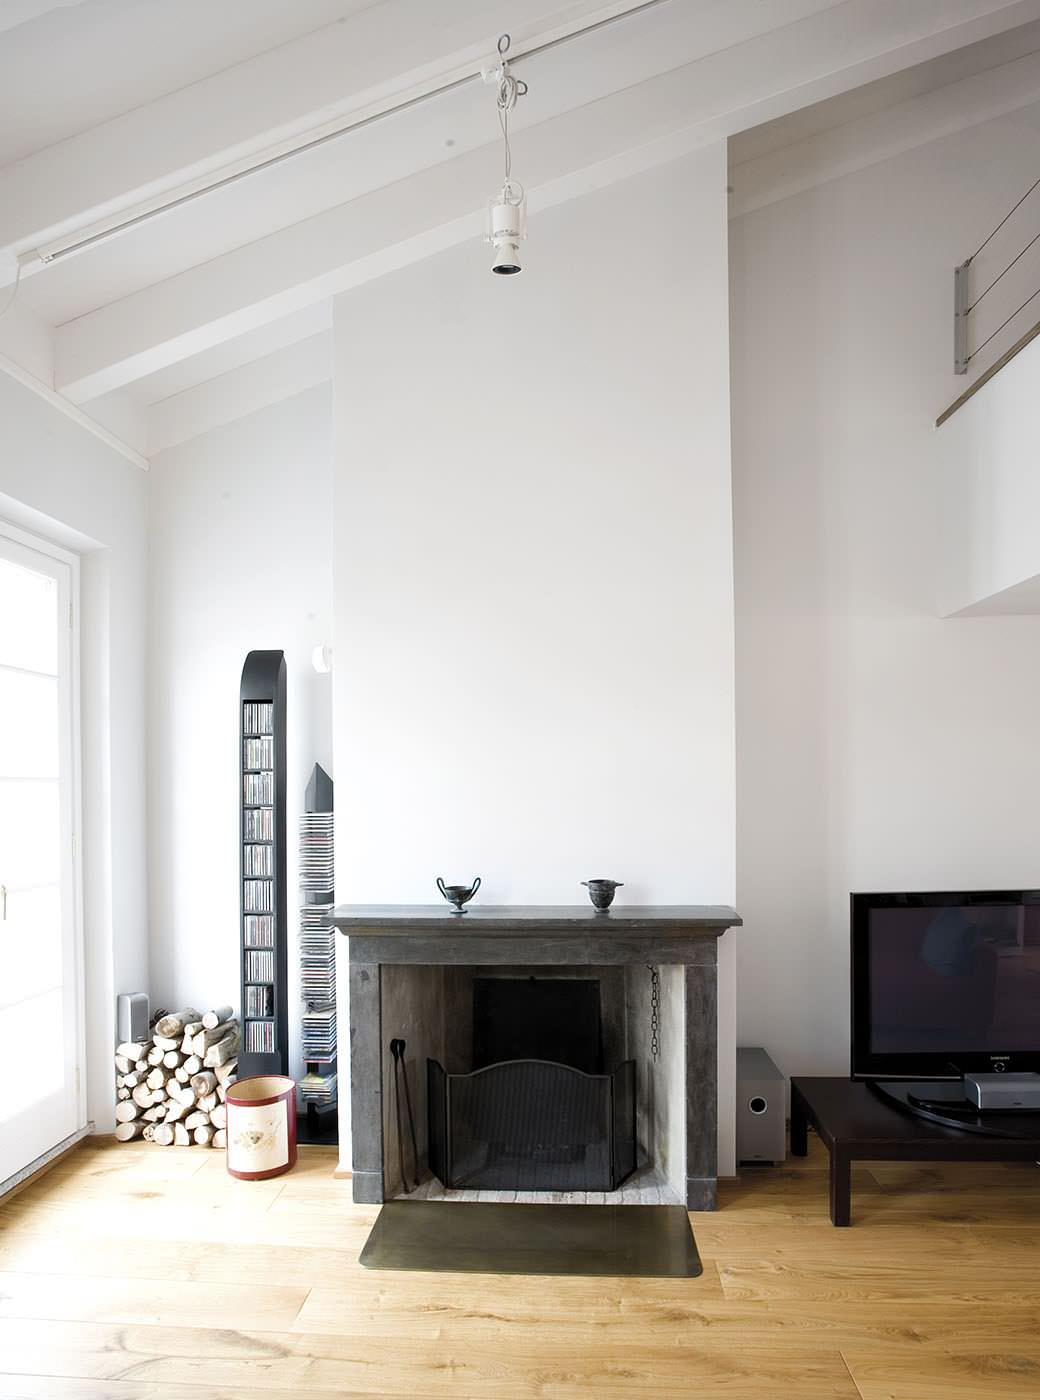 Penthouse in legno - 150 mq